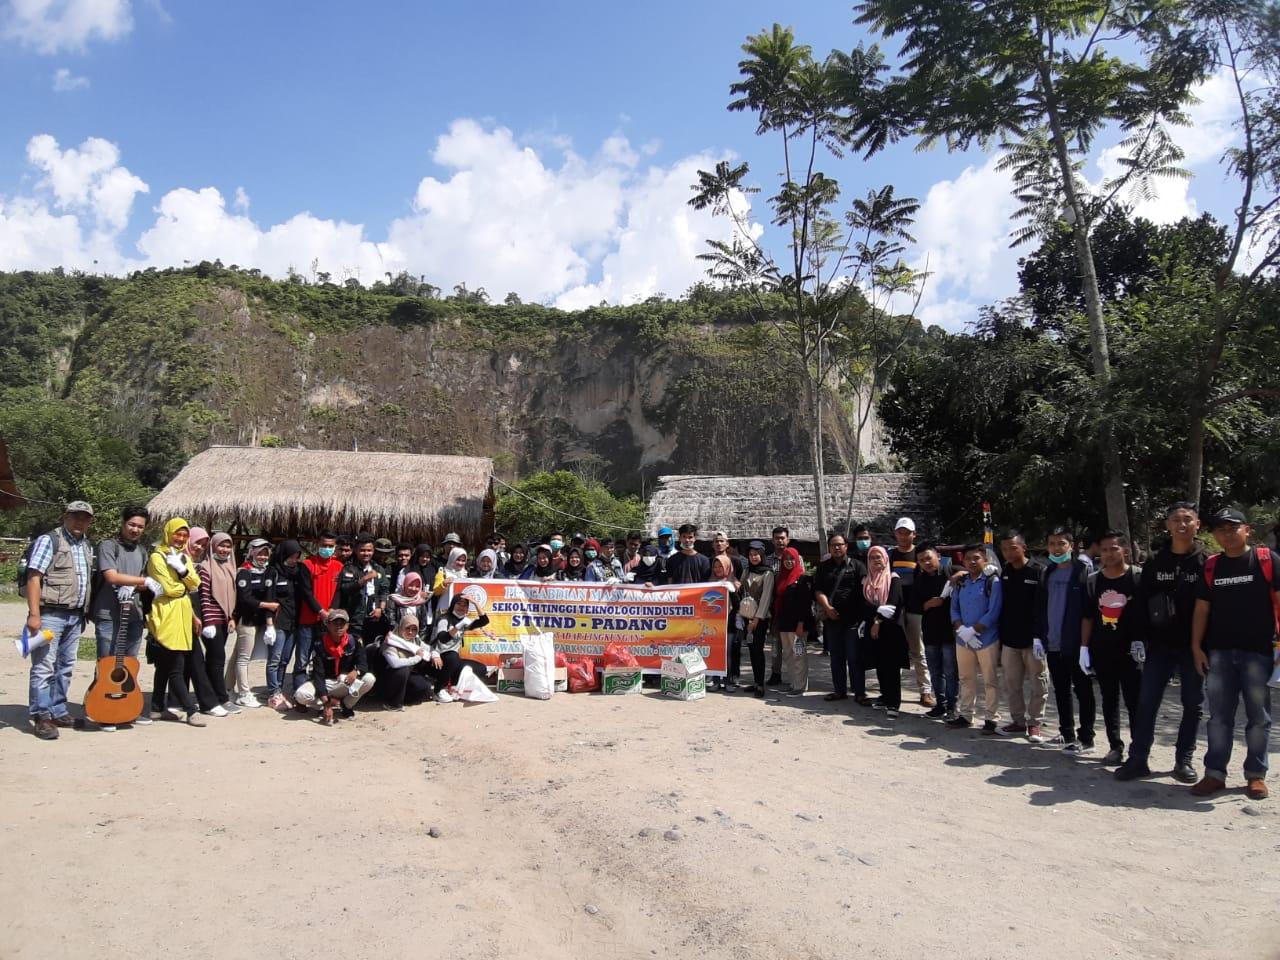 Pengabdian Masyarakat Sekolah Tinggi Teknologi Industri (STTIND) Padang Ke Kawasan Geopark Ngarai Sianok - Maninjau